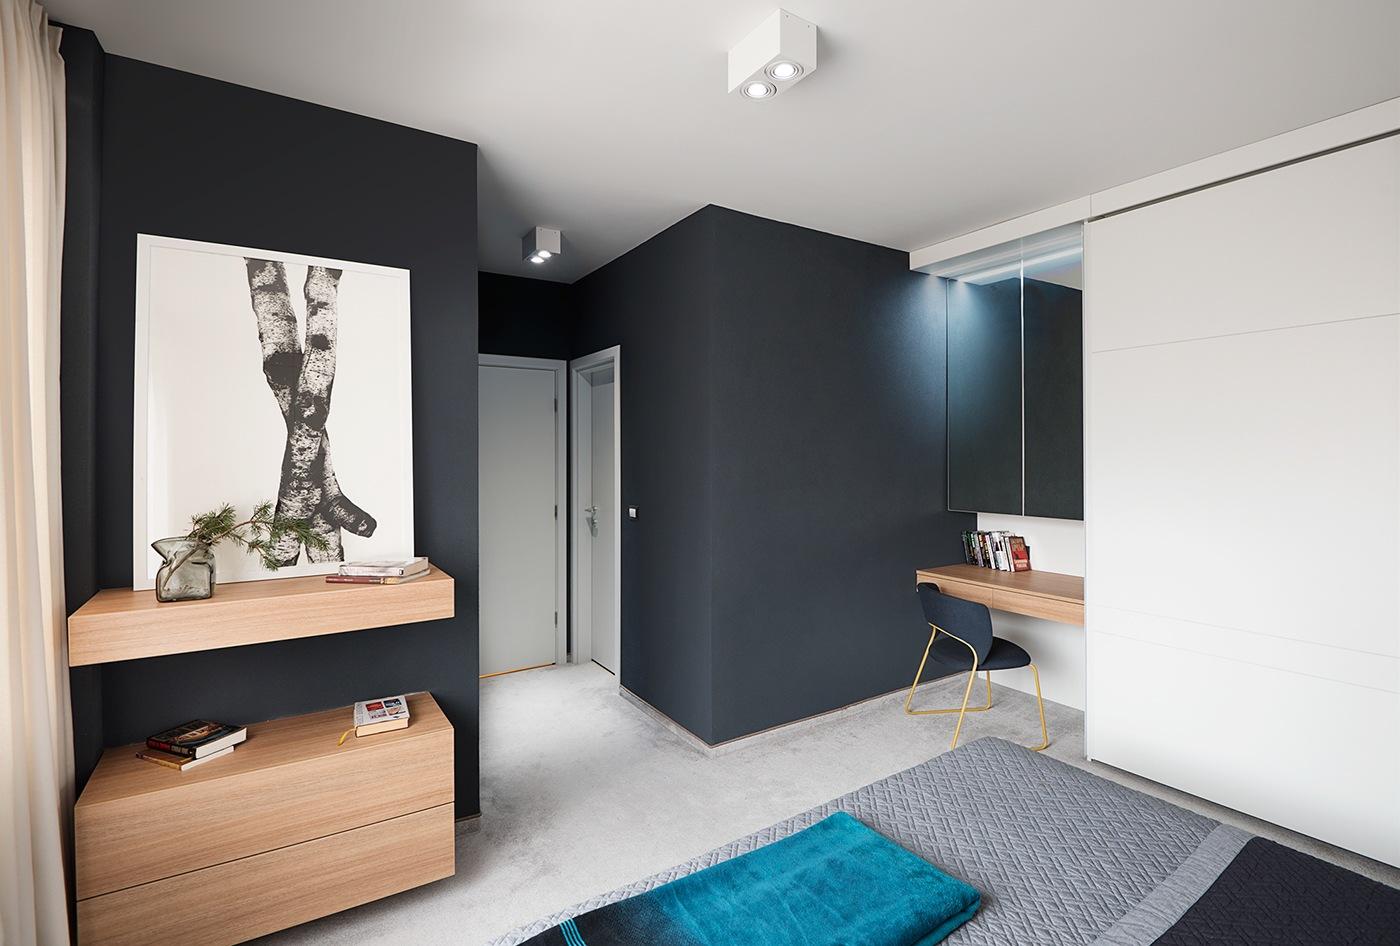 Minimalist apartment design With Simple Wooden Interior ...